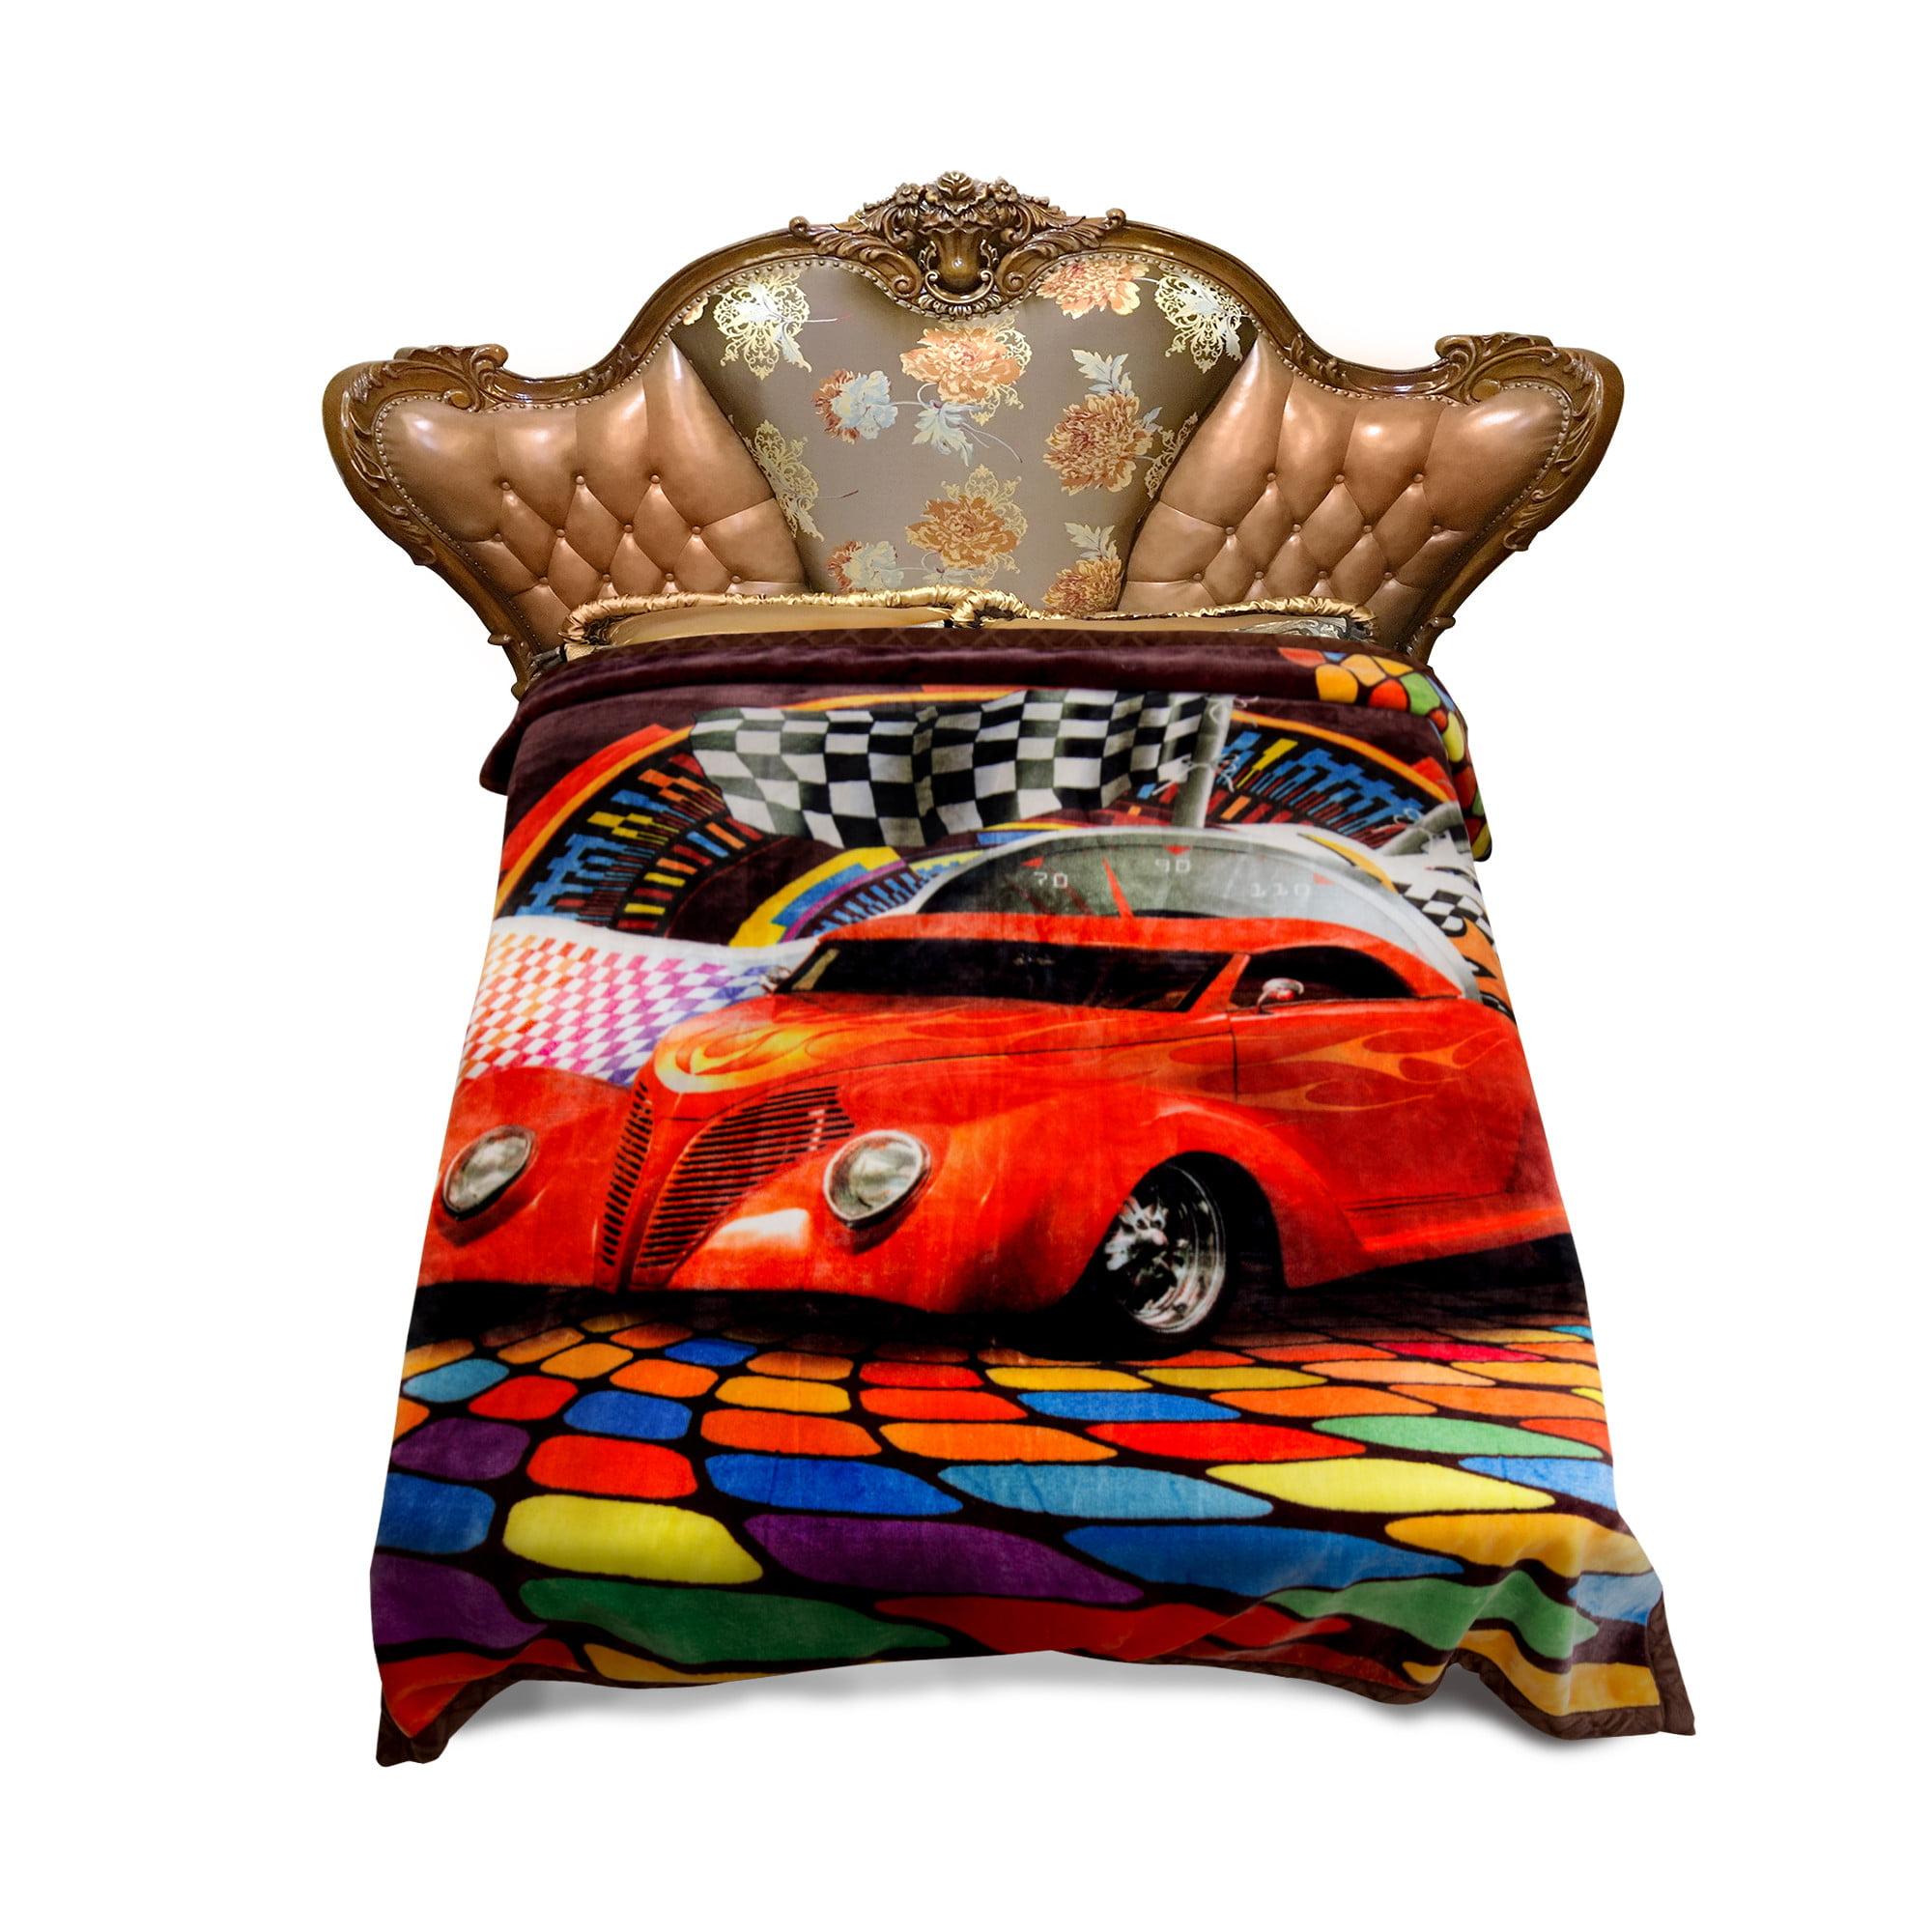 King Size Warm Raschel Blanket Soft Plush Heavy Thick Fleece Blanket For Winter 2 Ply 3D... by JML